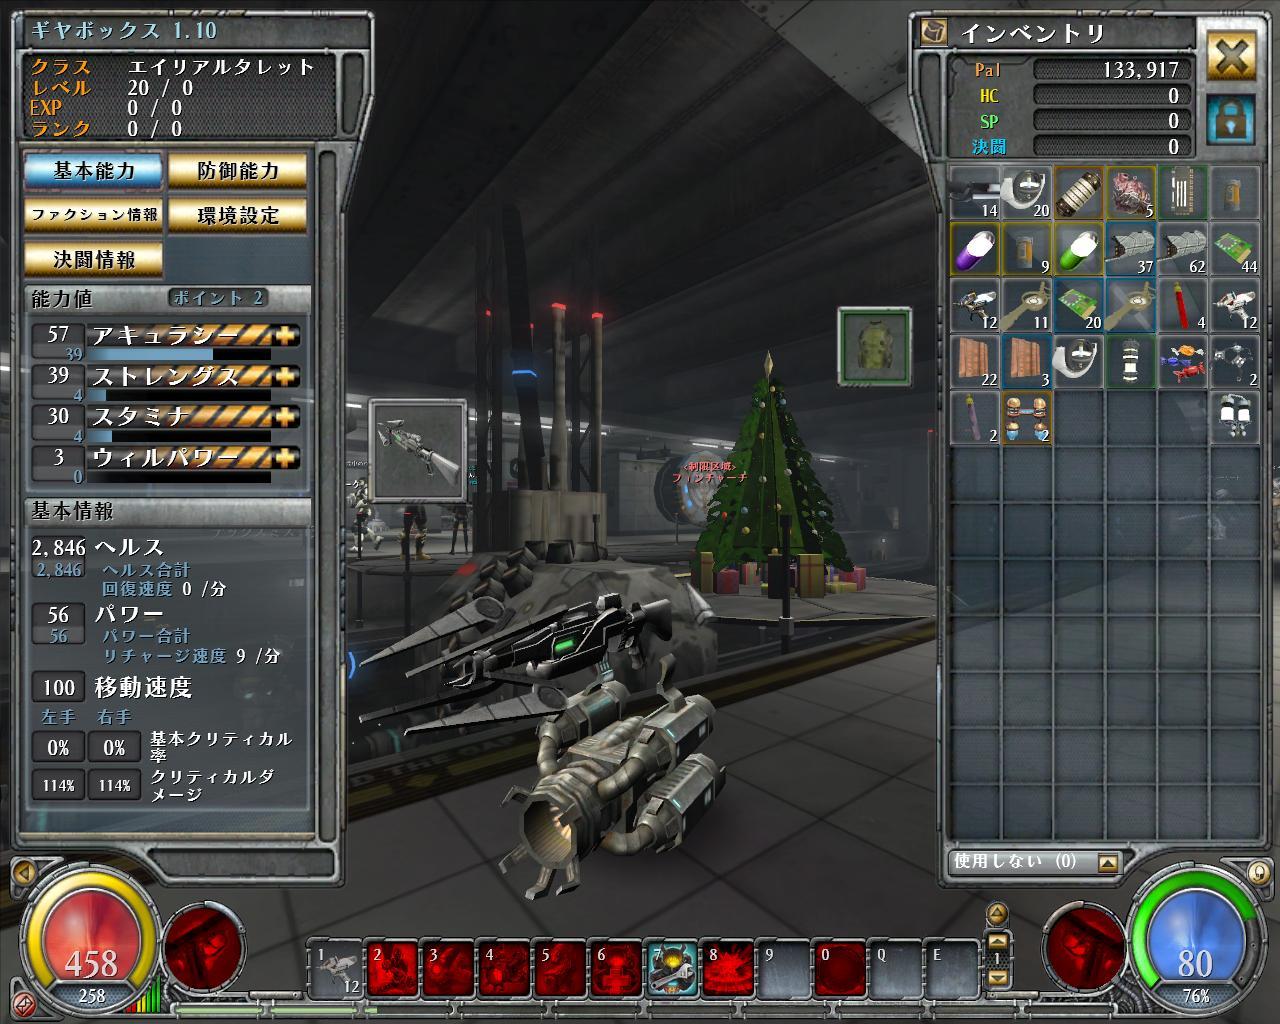 Hellgate_2010_12_12 14_27_15